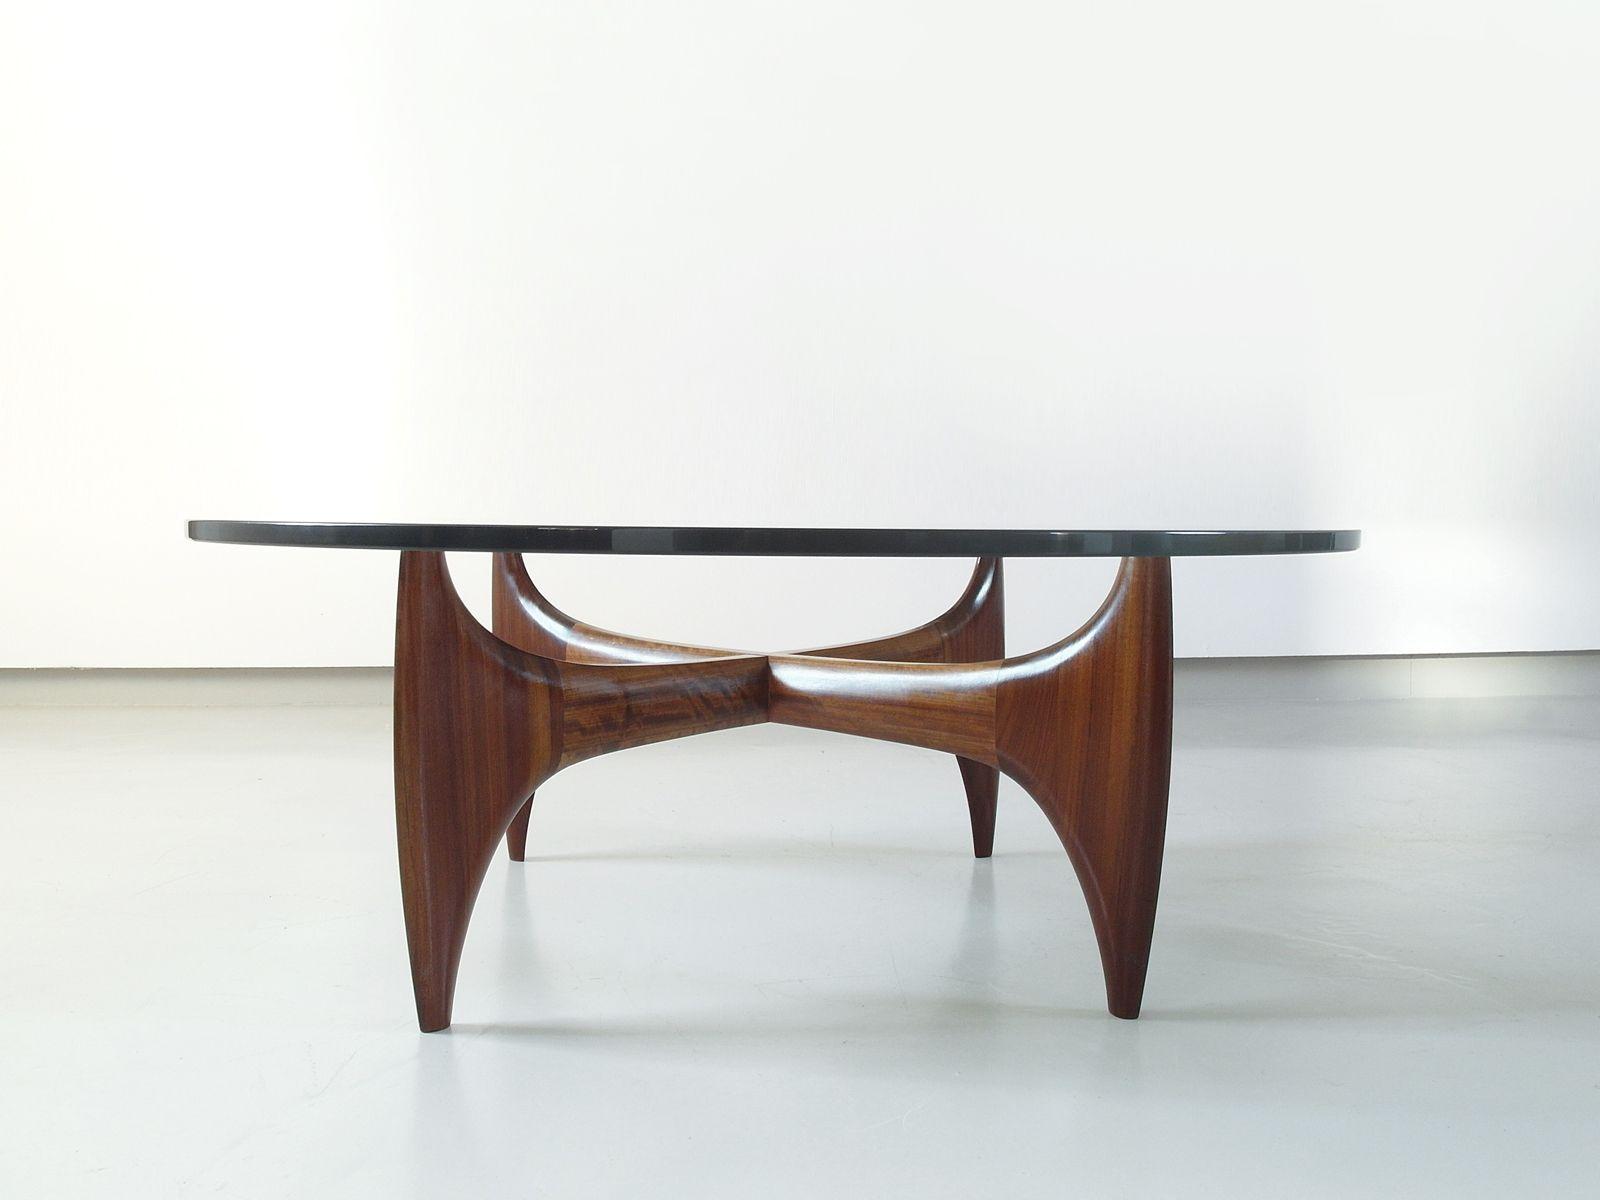 Brazilian Sculptural Coffee Table in Solid Jacaranda Wood 1960s